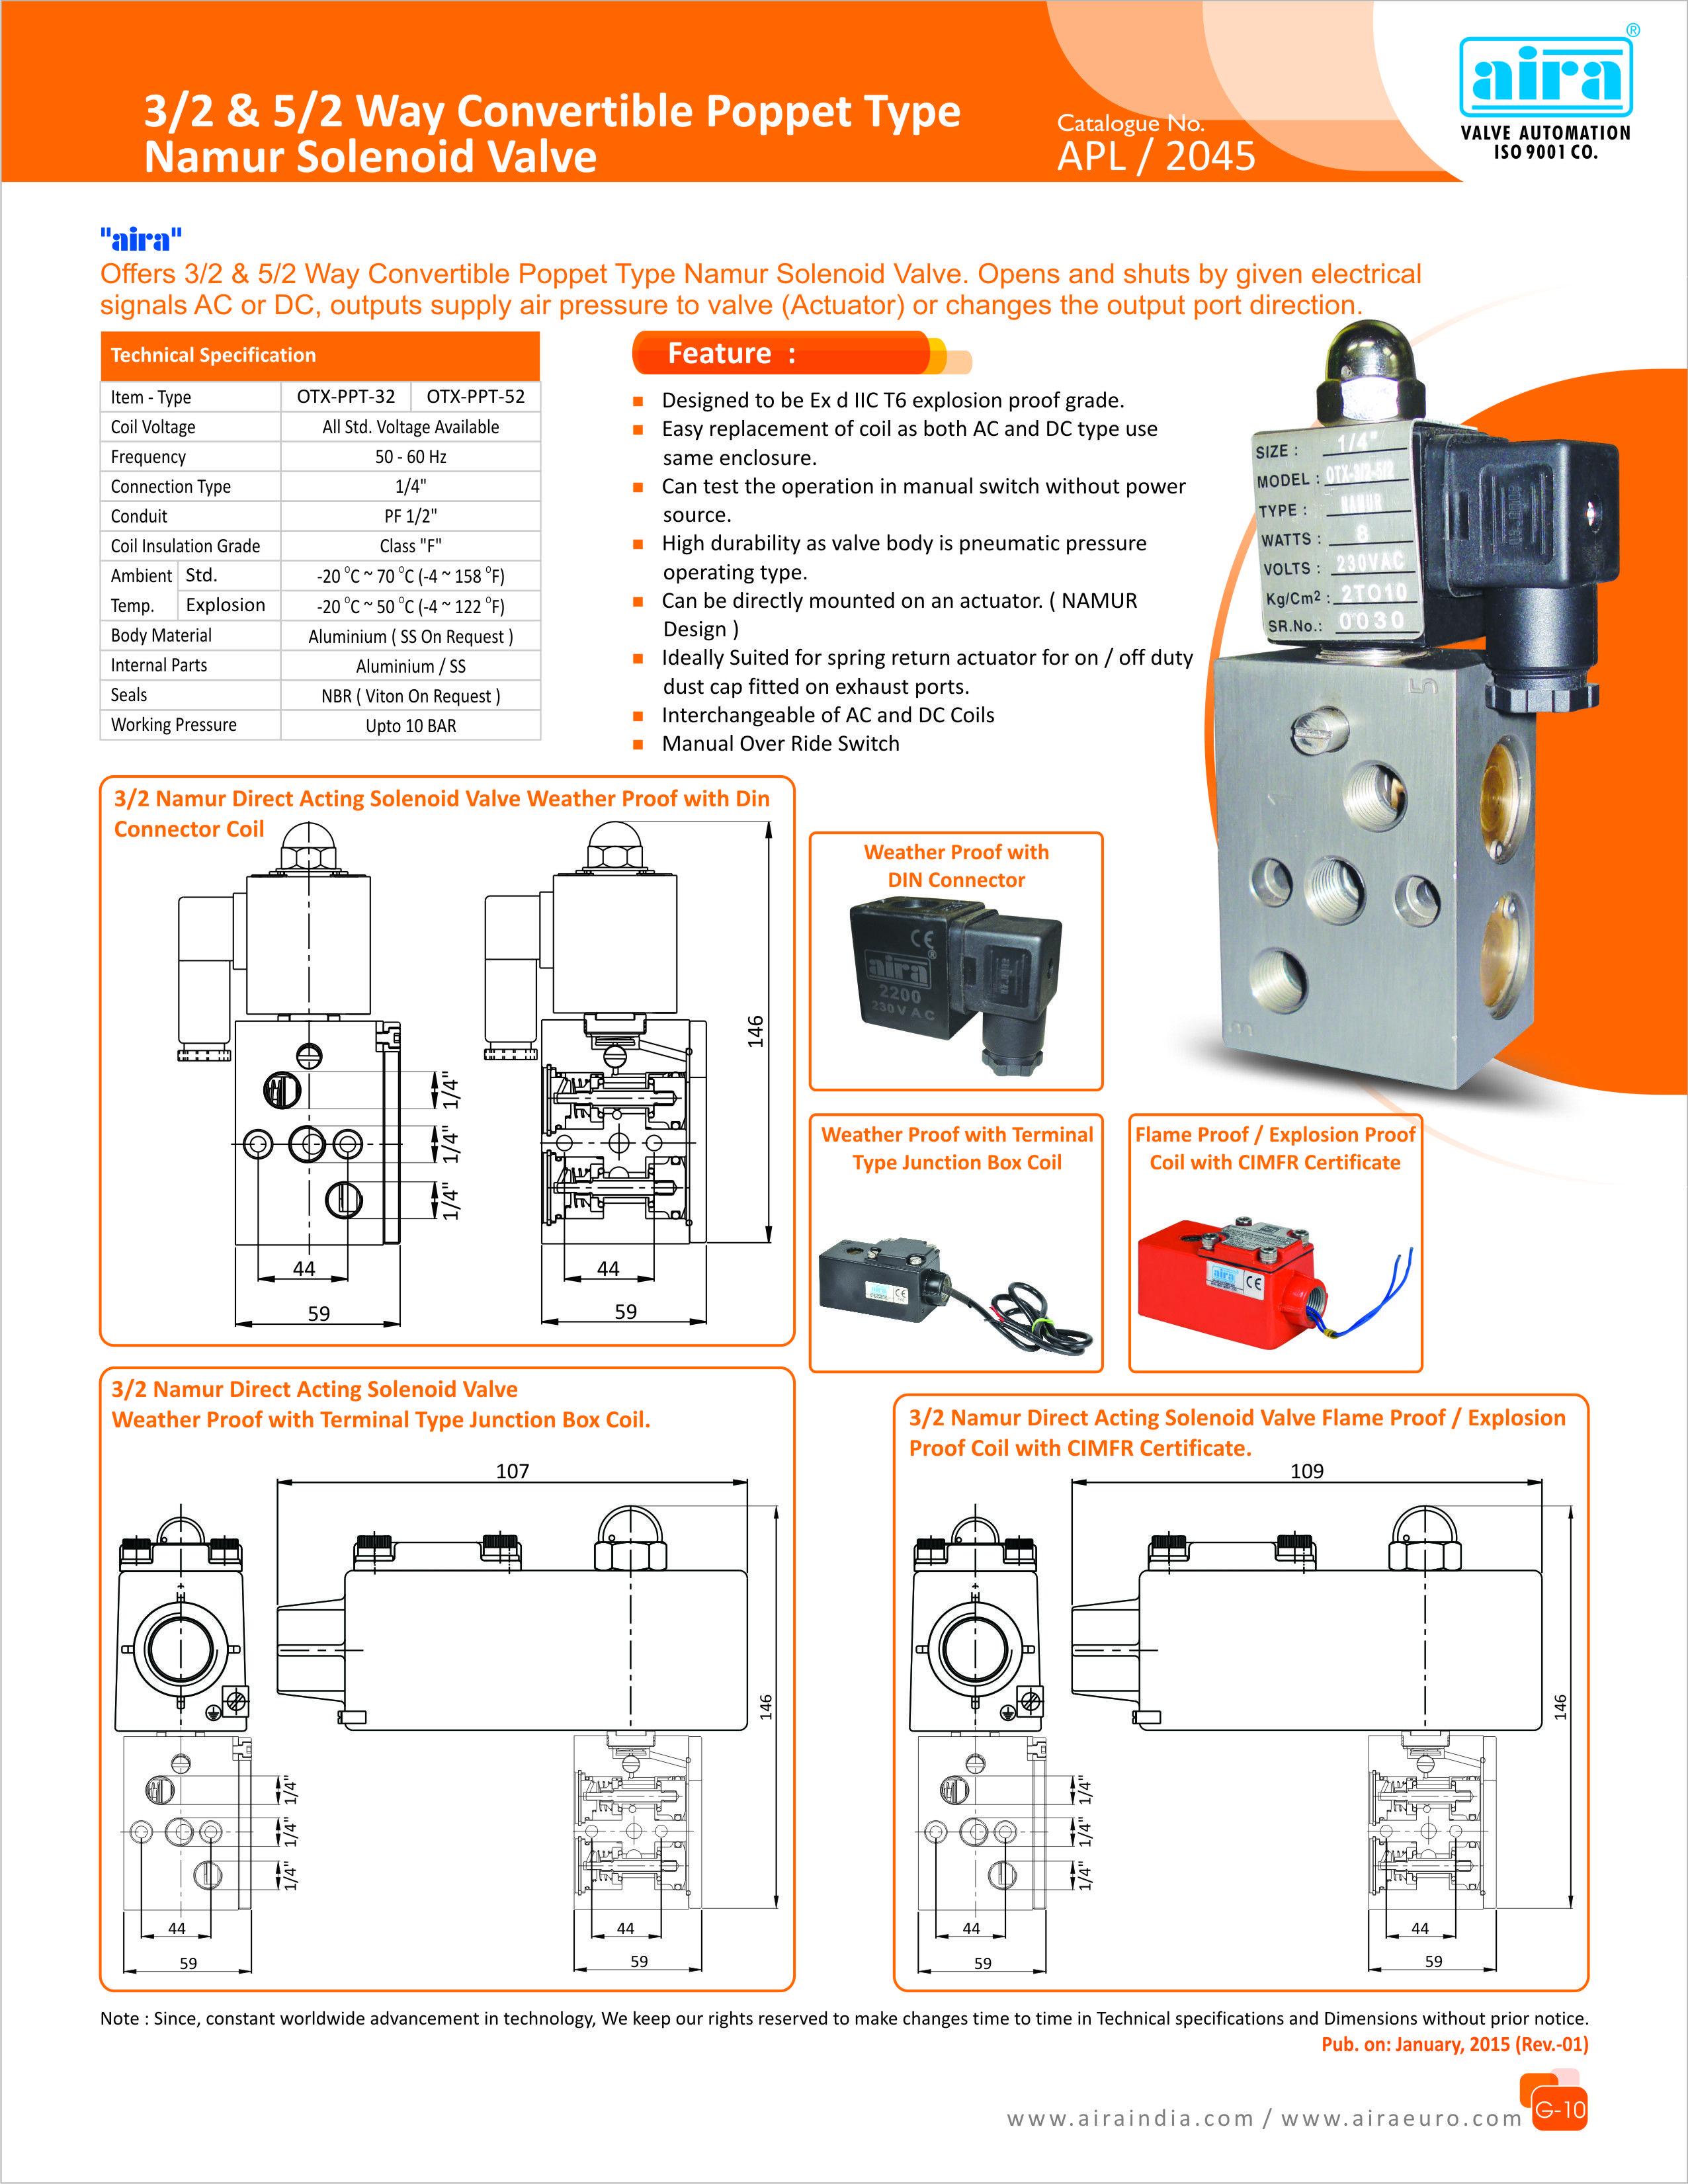 3 2 5 Way Convertible Poppet Type Namur Solenoid Valve For More Air Pressor 240 Volt Wiring Diagram Info Visit Now At Airaindiacom